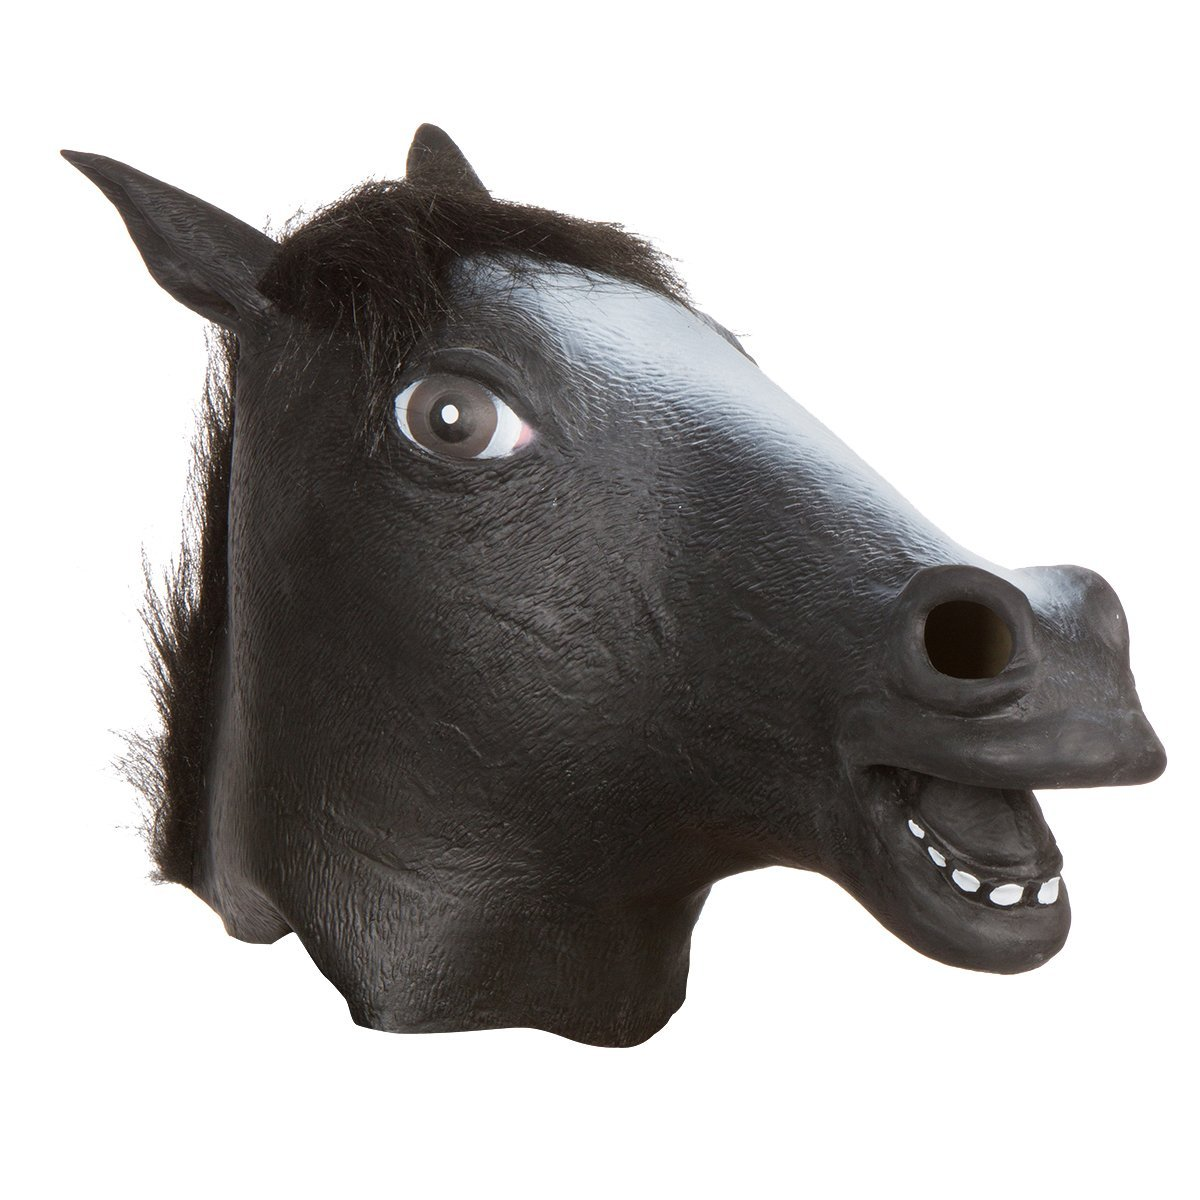 Horse Head Full Mask Animal Soft Rubber Latex Black Costume Adult Teen